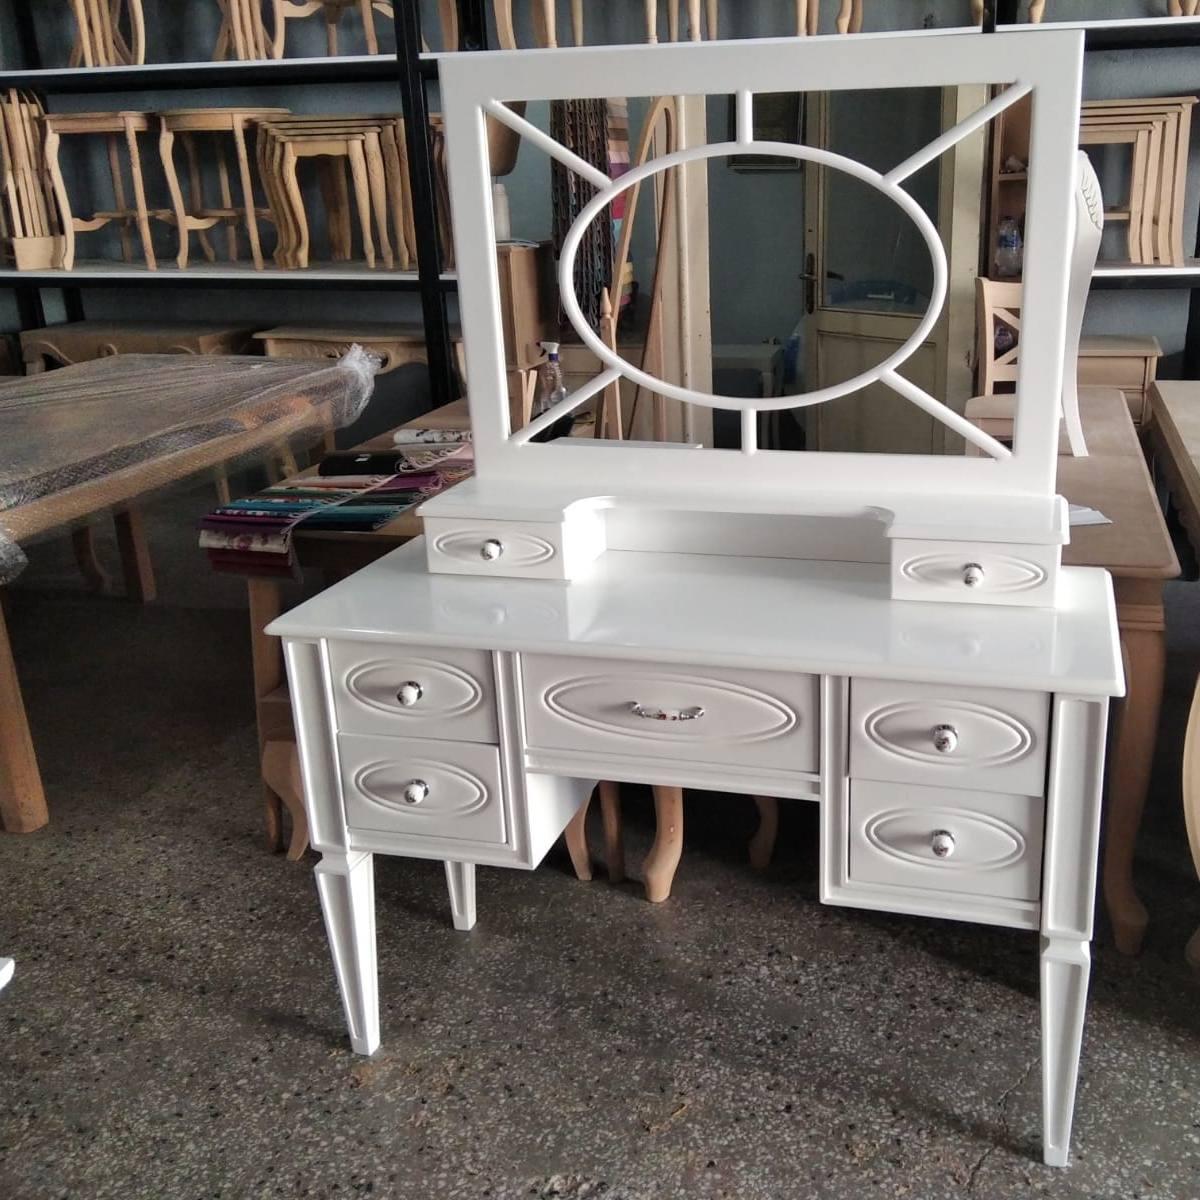 beyaz-makyaj-masasi-ARDIC-Mobilya-Aksesuar-41075